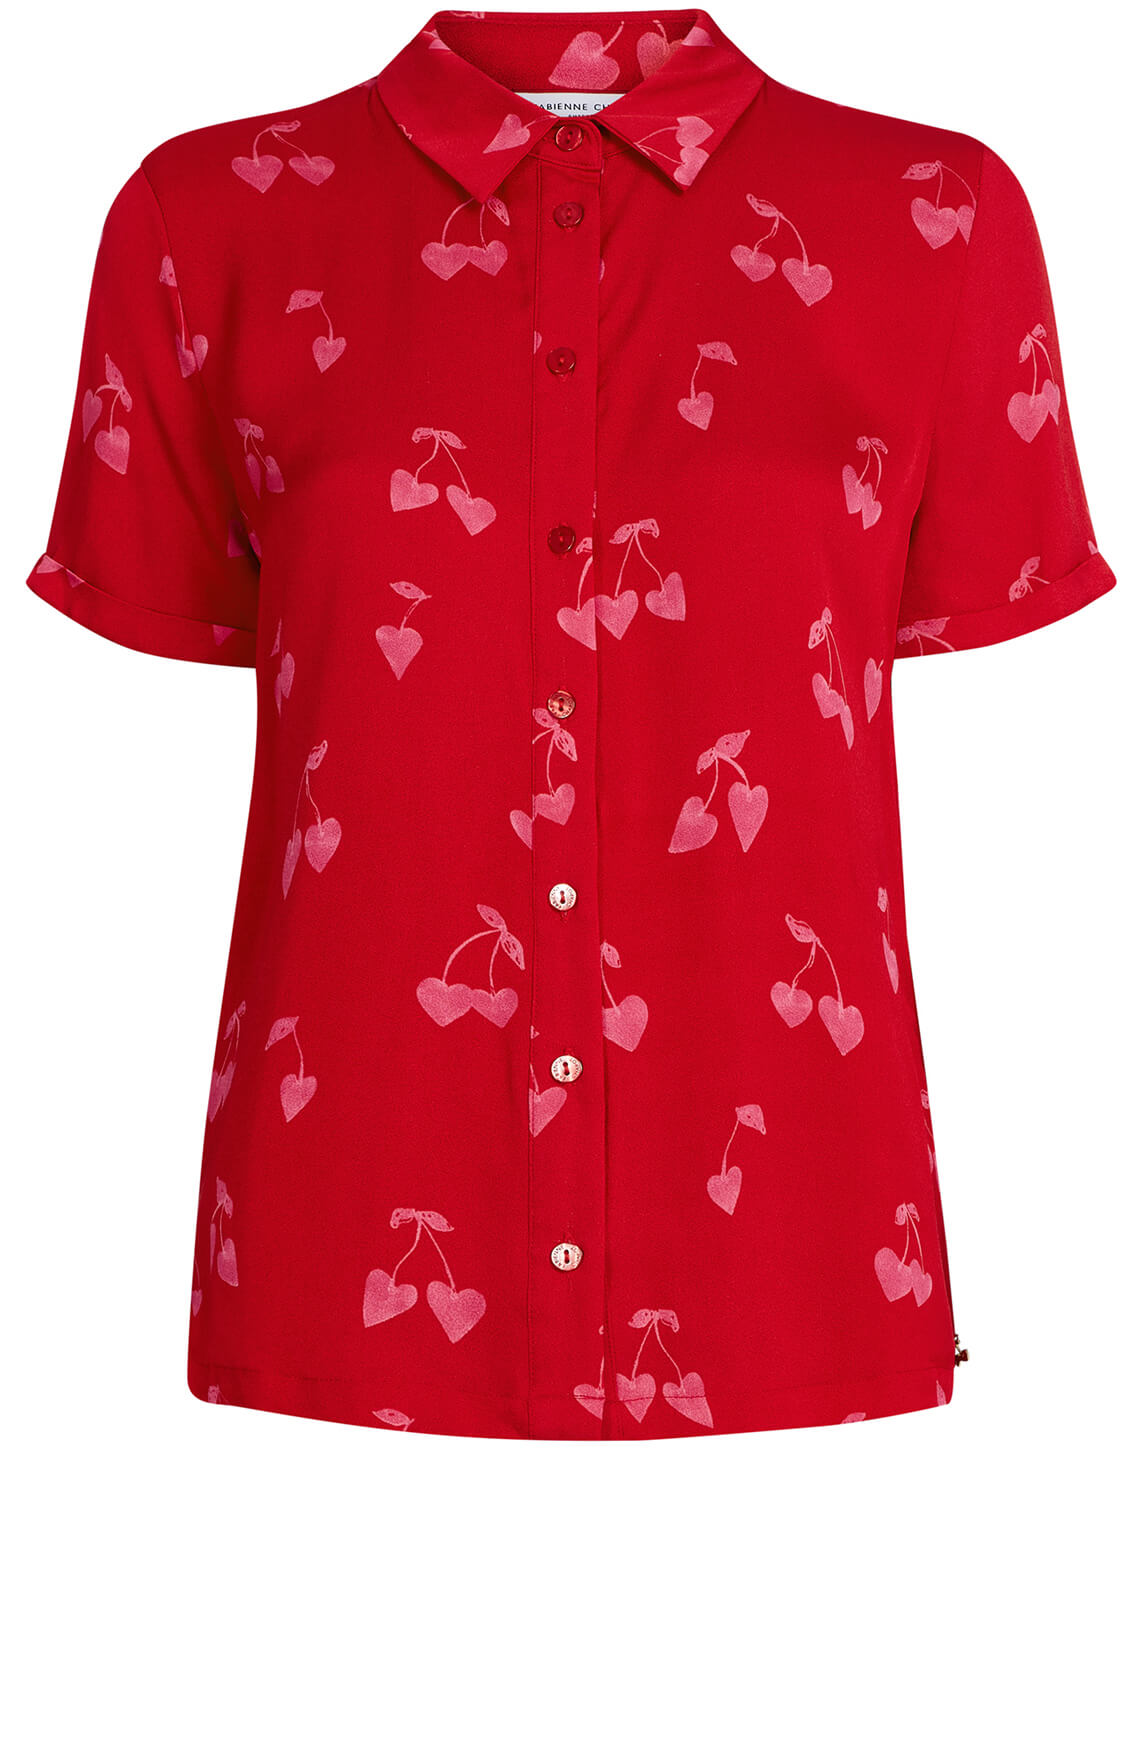 Fabienne Chapot Dames Enyo cherry blouse Rood